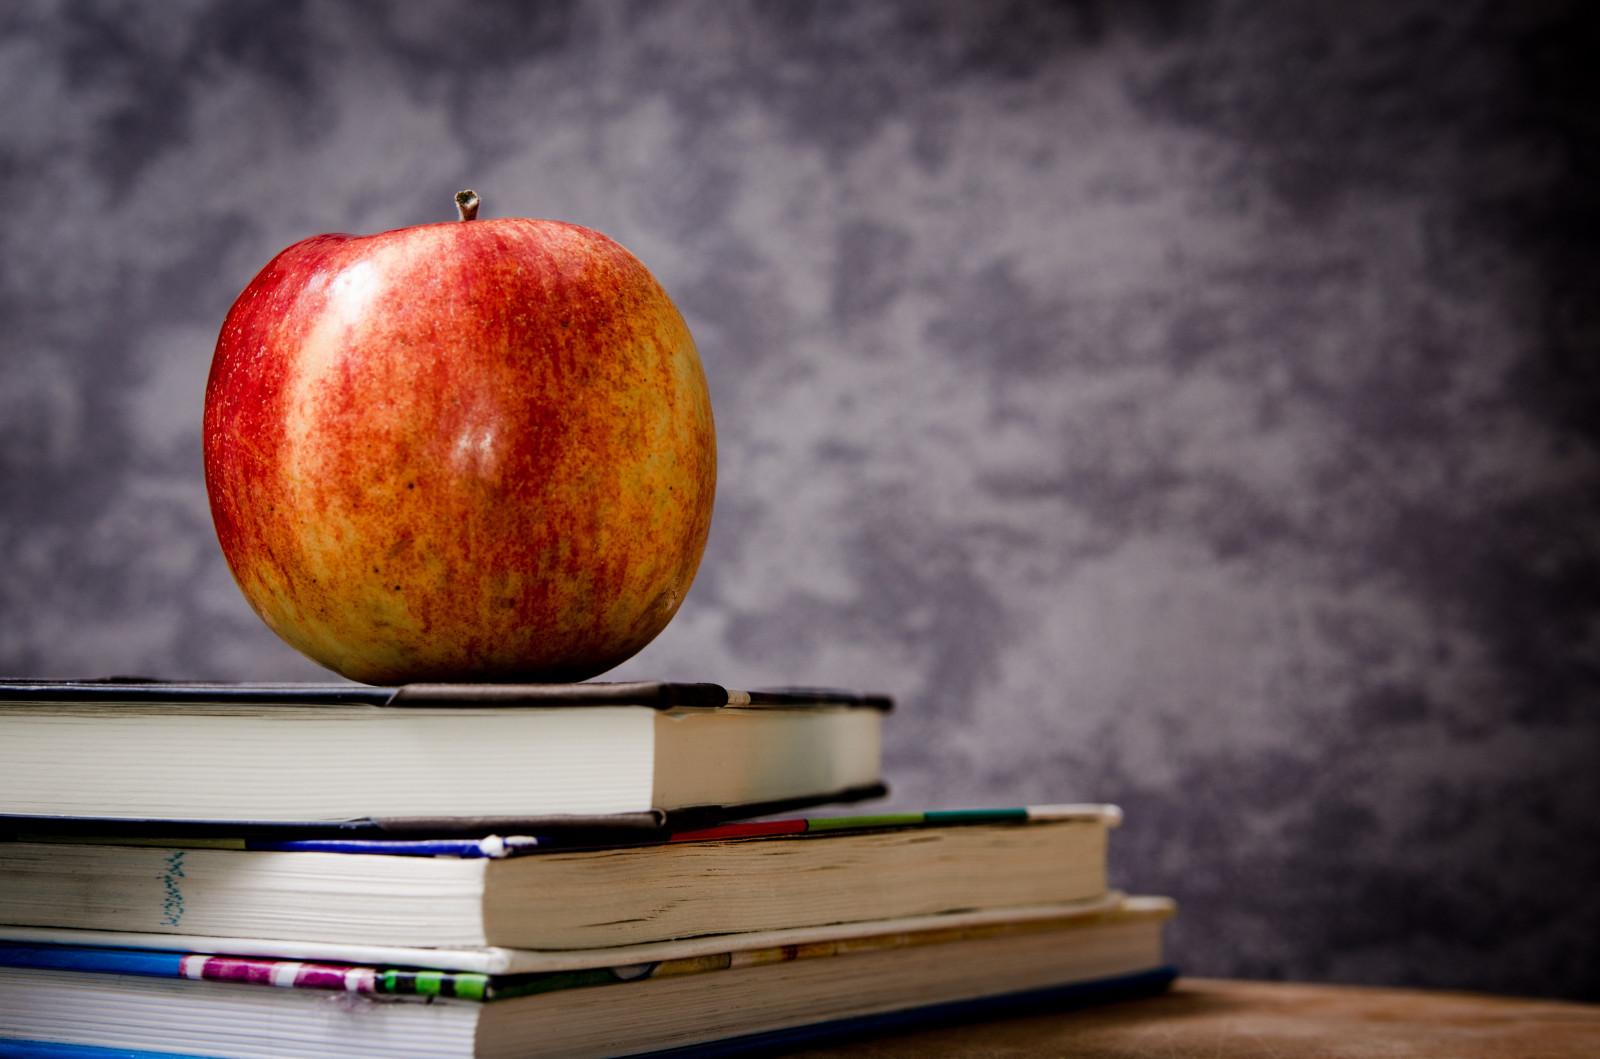 Hintergrundbilder : Malerei, Lebensmittel, Frucht, Farbe, Apfel ...